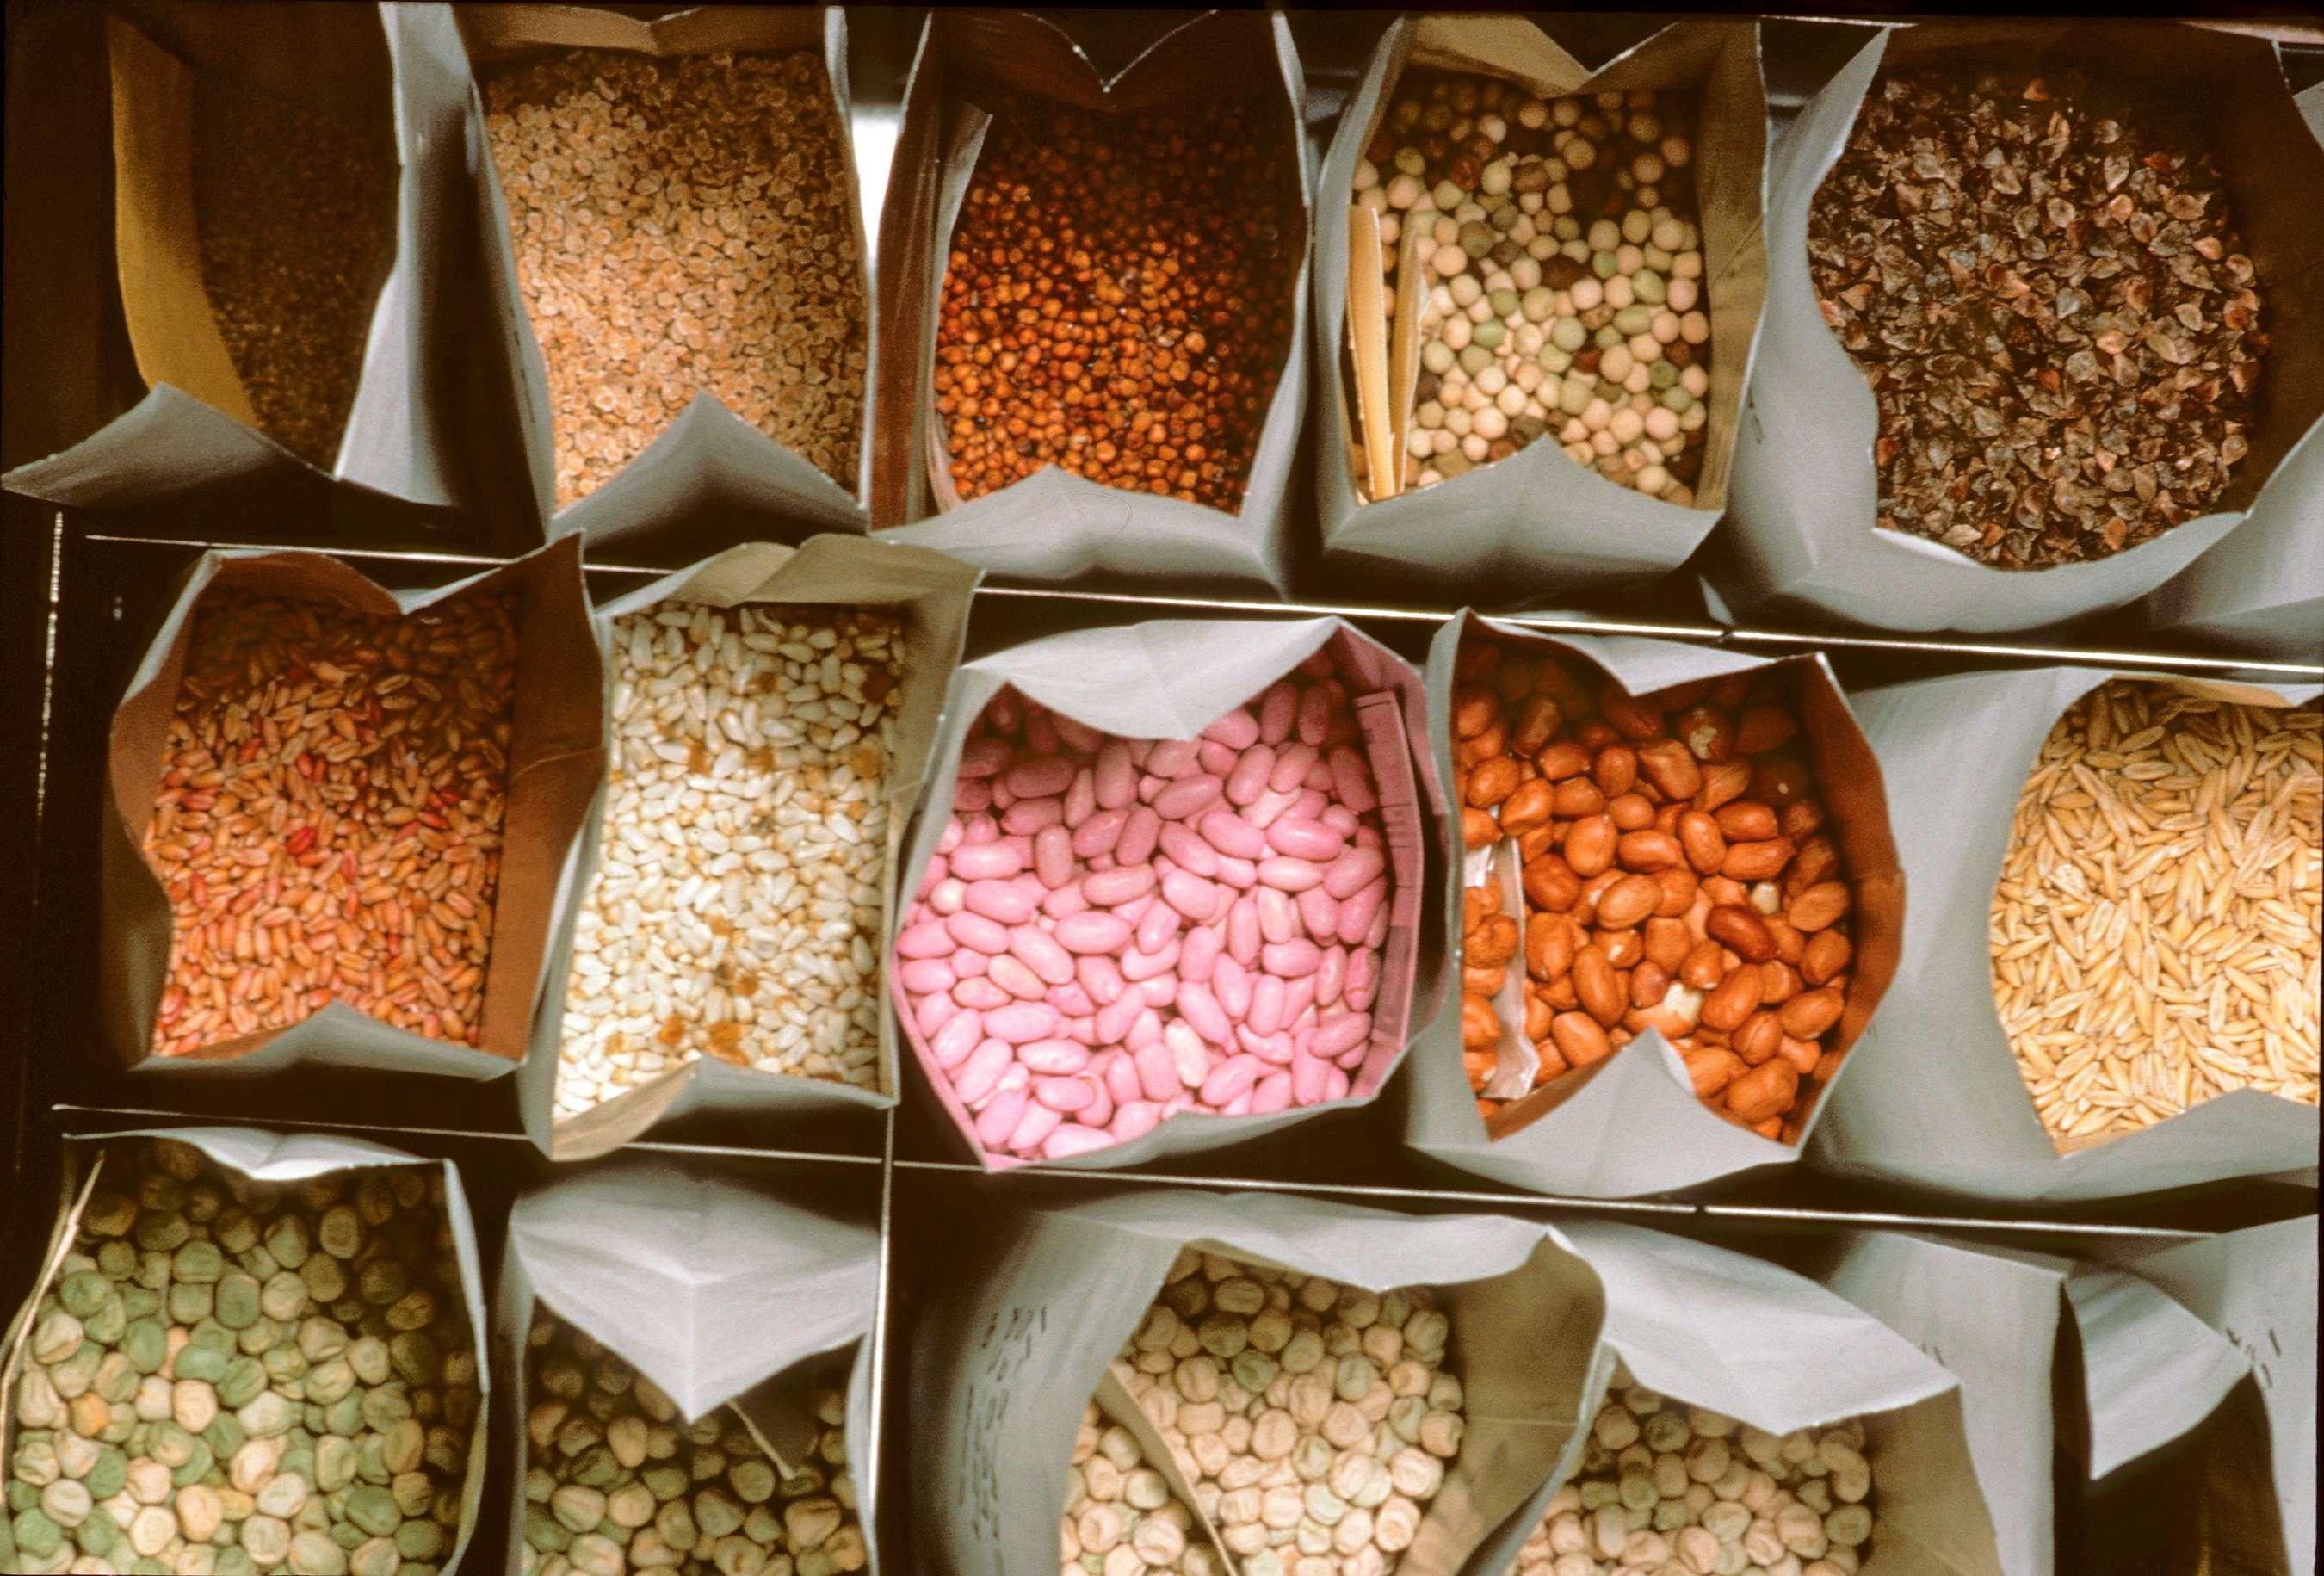 KOKOPELLI: Νέες διευκολύνσεις για τη βιομηχανία σπόρων;